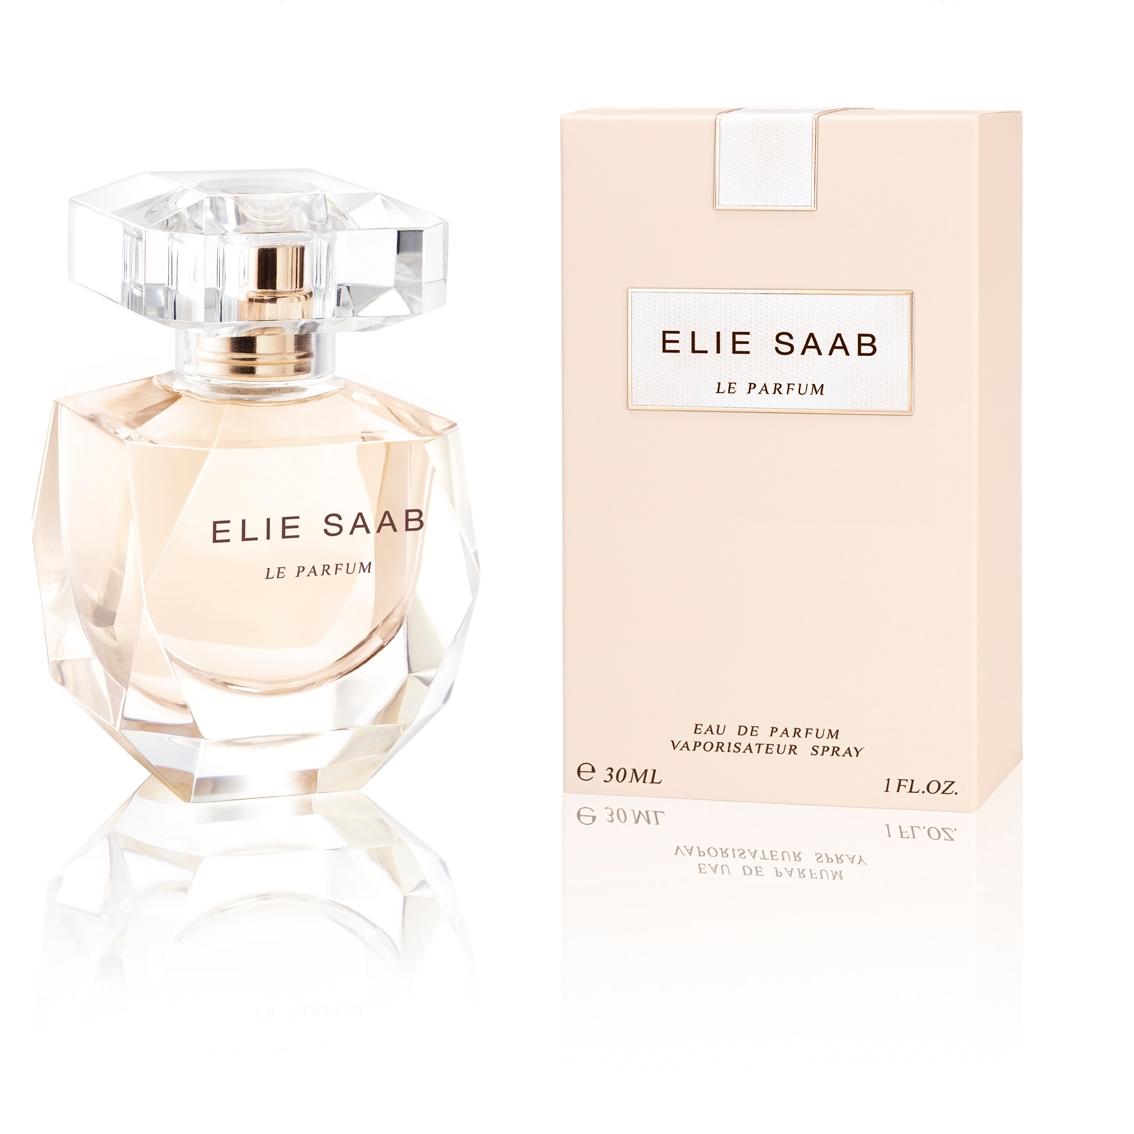 Elie Saab Le Parfum edp pray donna 30 ml